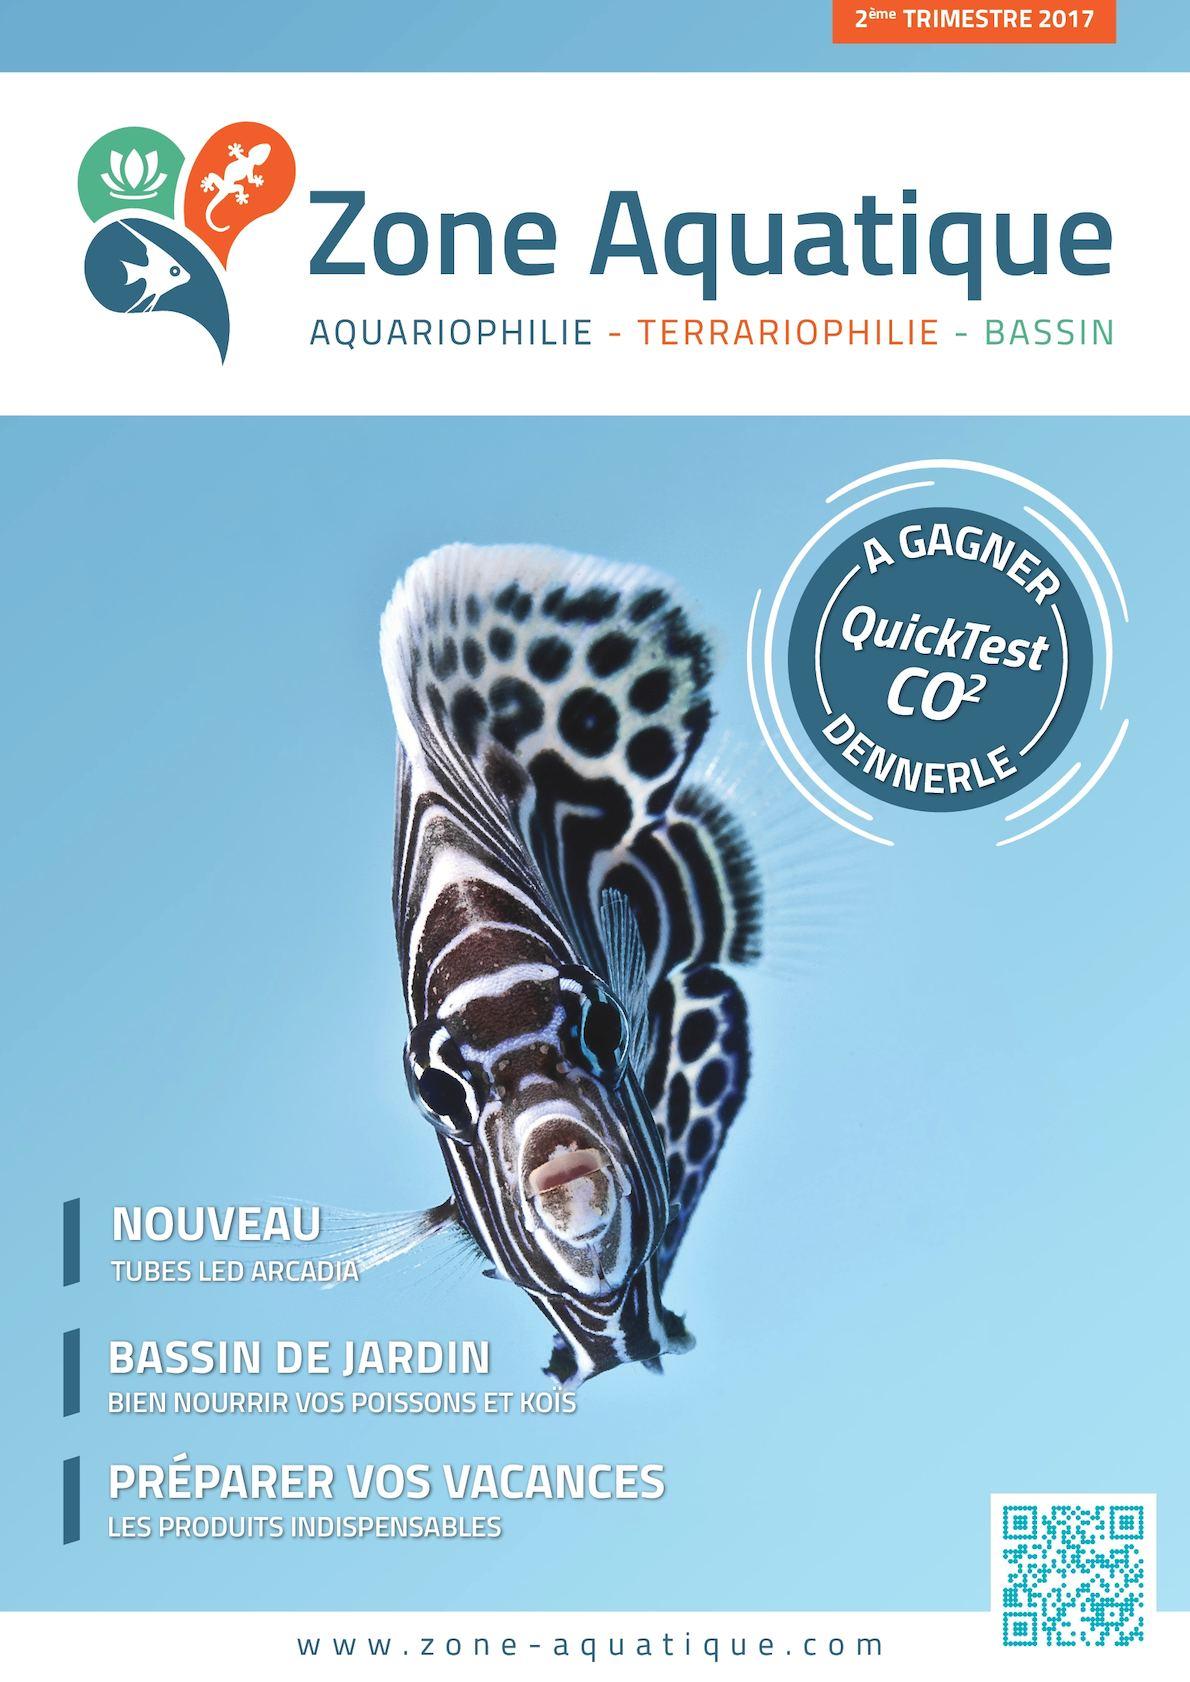 Magazine Zone Aquatique - 2ème Trimestre 2017